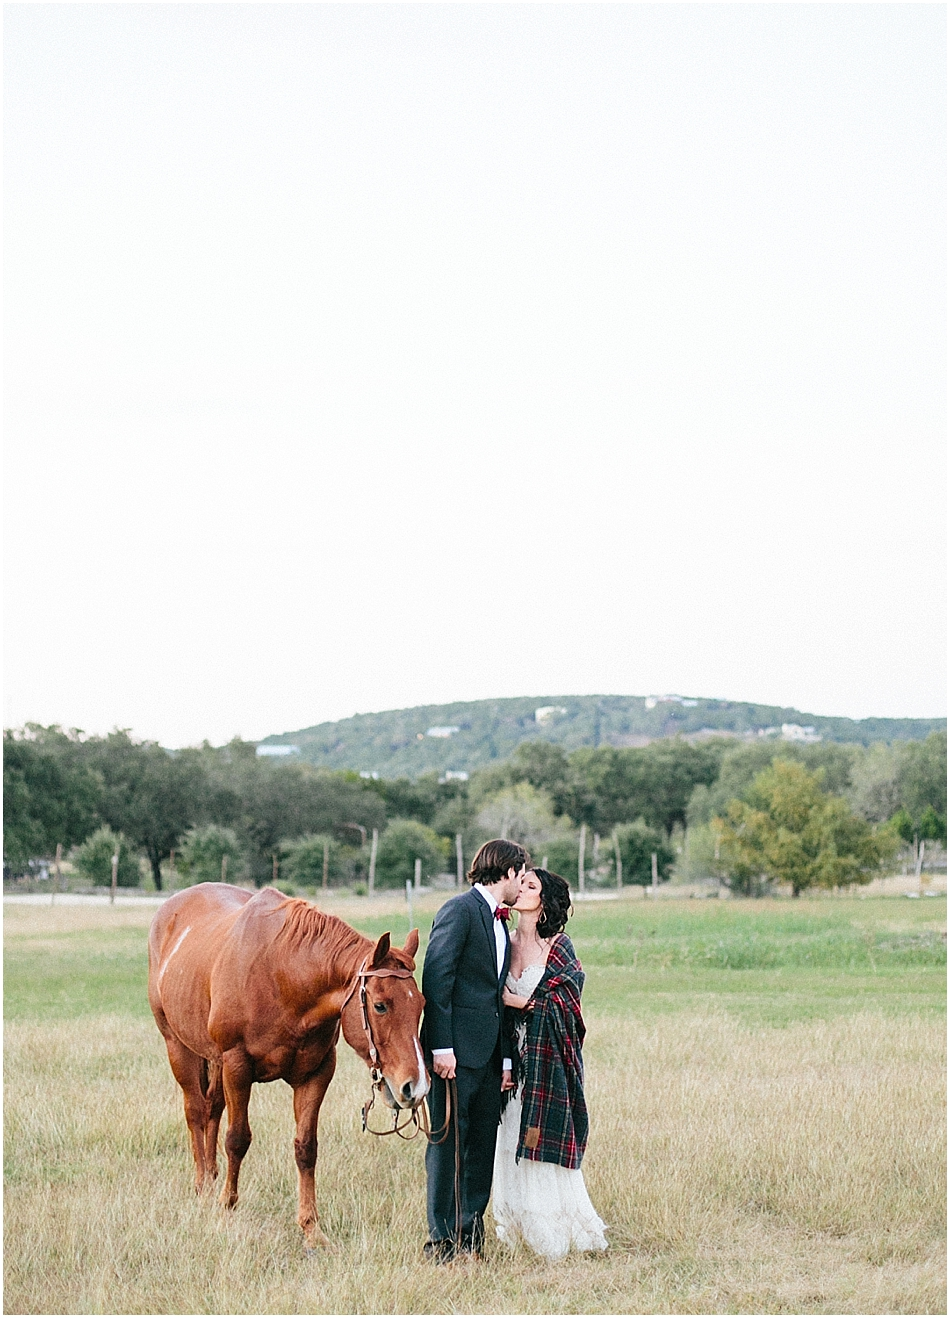 Cedar & Stone Workshop   Montesino Ranch   Film   Texas   Emilie Anne Photography-11.jpg